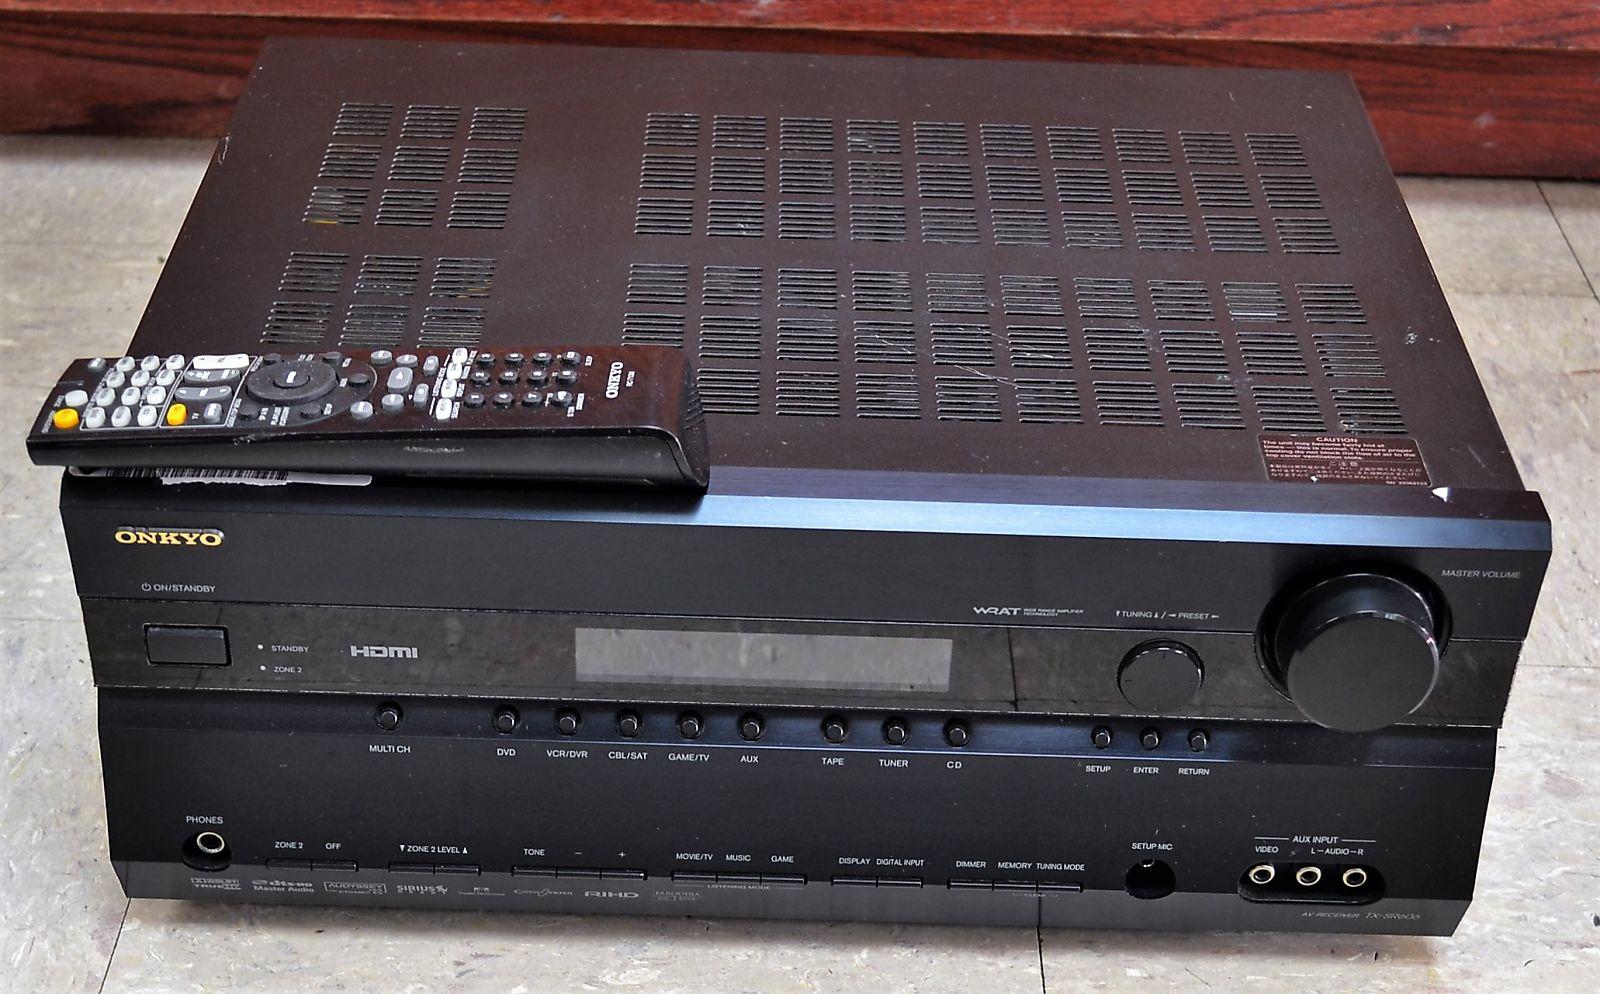 Onkyo TX-SR606 7.1 AV Amplifier Receiver (Used) Xznzhs1mrxyz2scsojpk